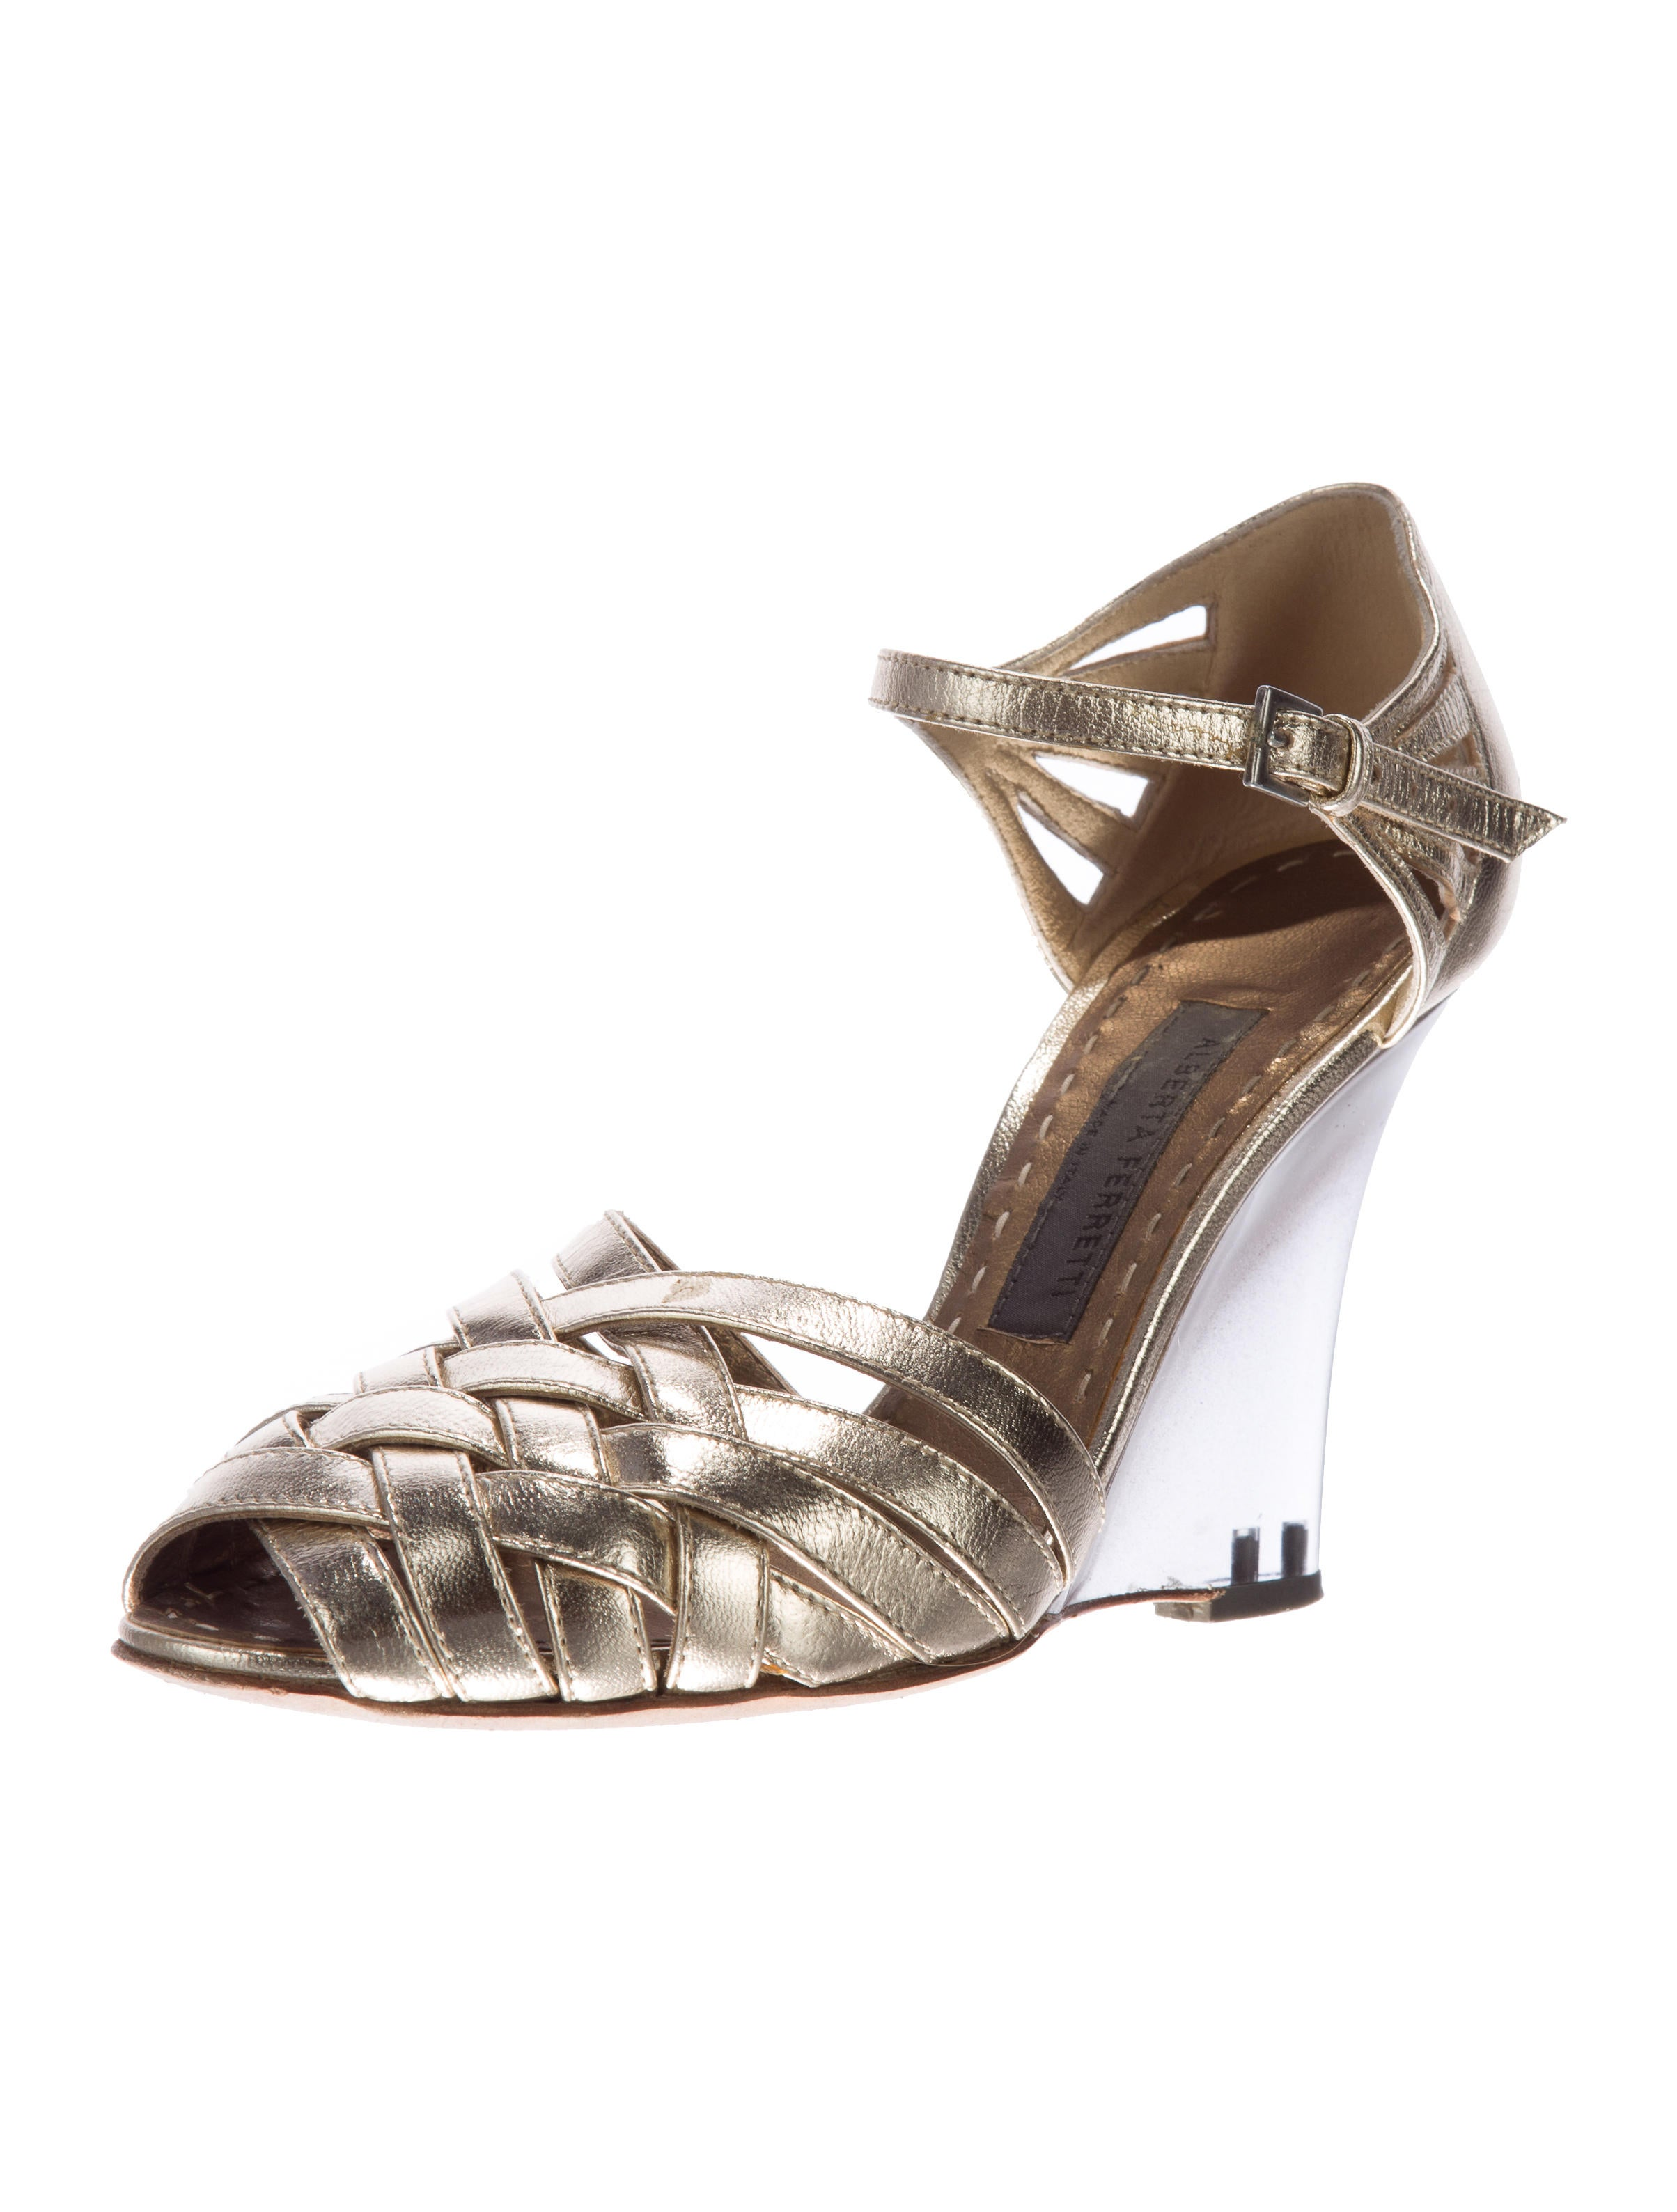 alberta ferretti metallic wedge sandals shoes alb24040